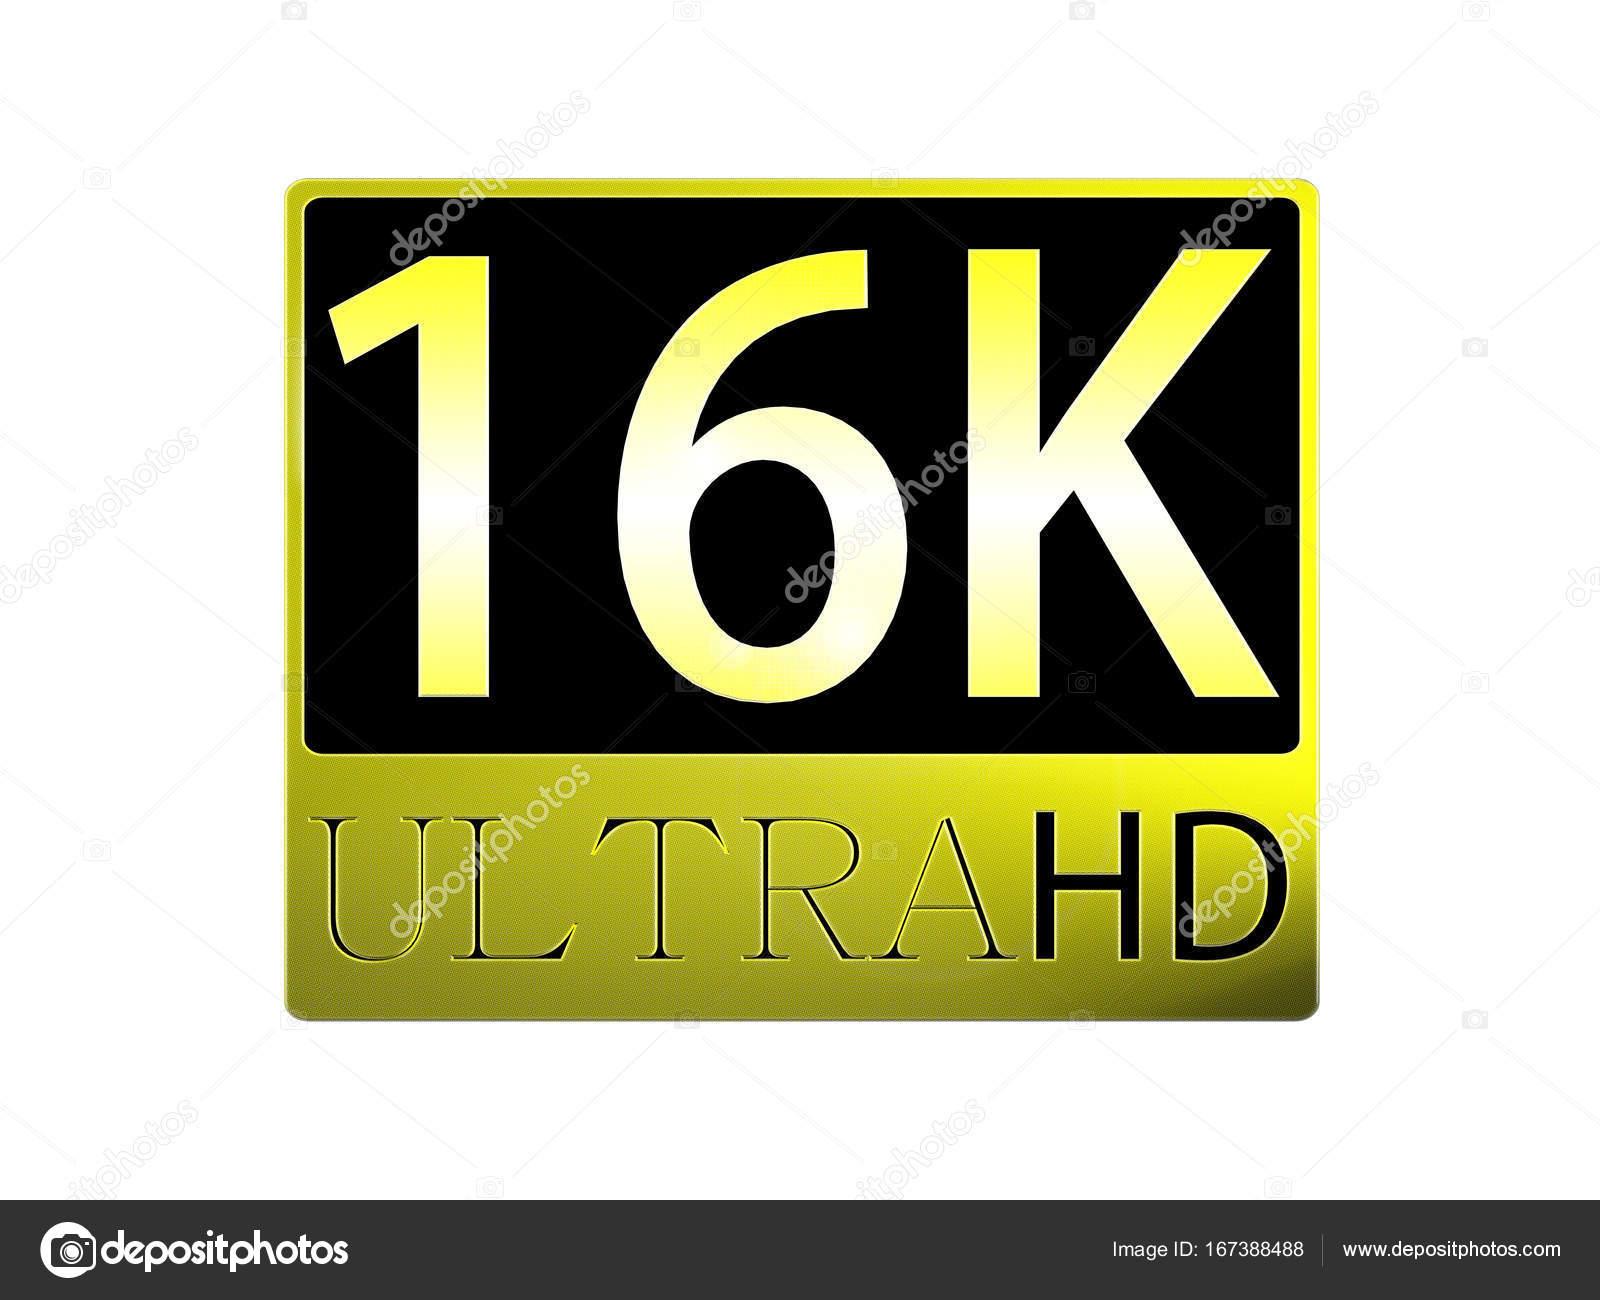 Renderizado 3d De Vistas De Imagen Ultra Hd 16k Foto De